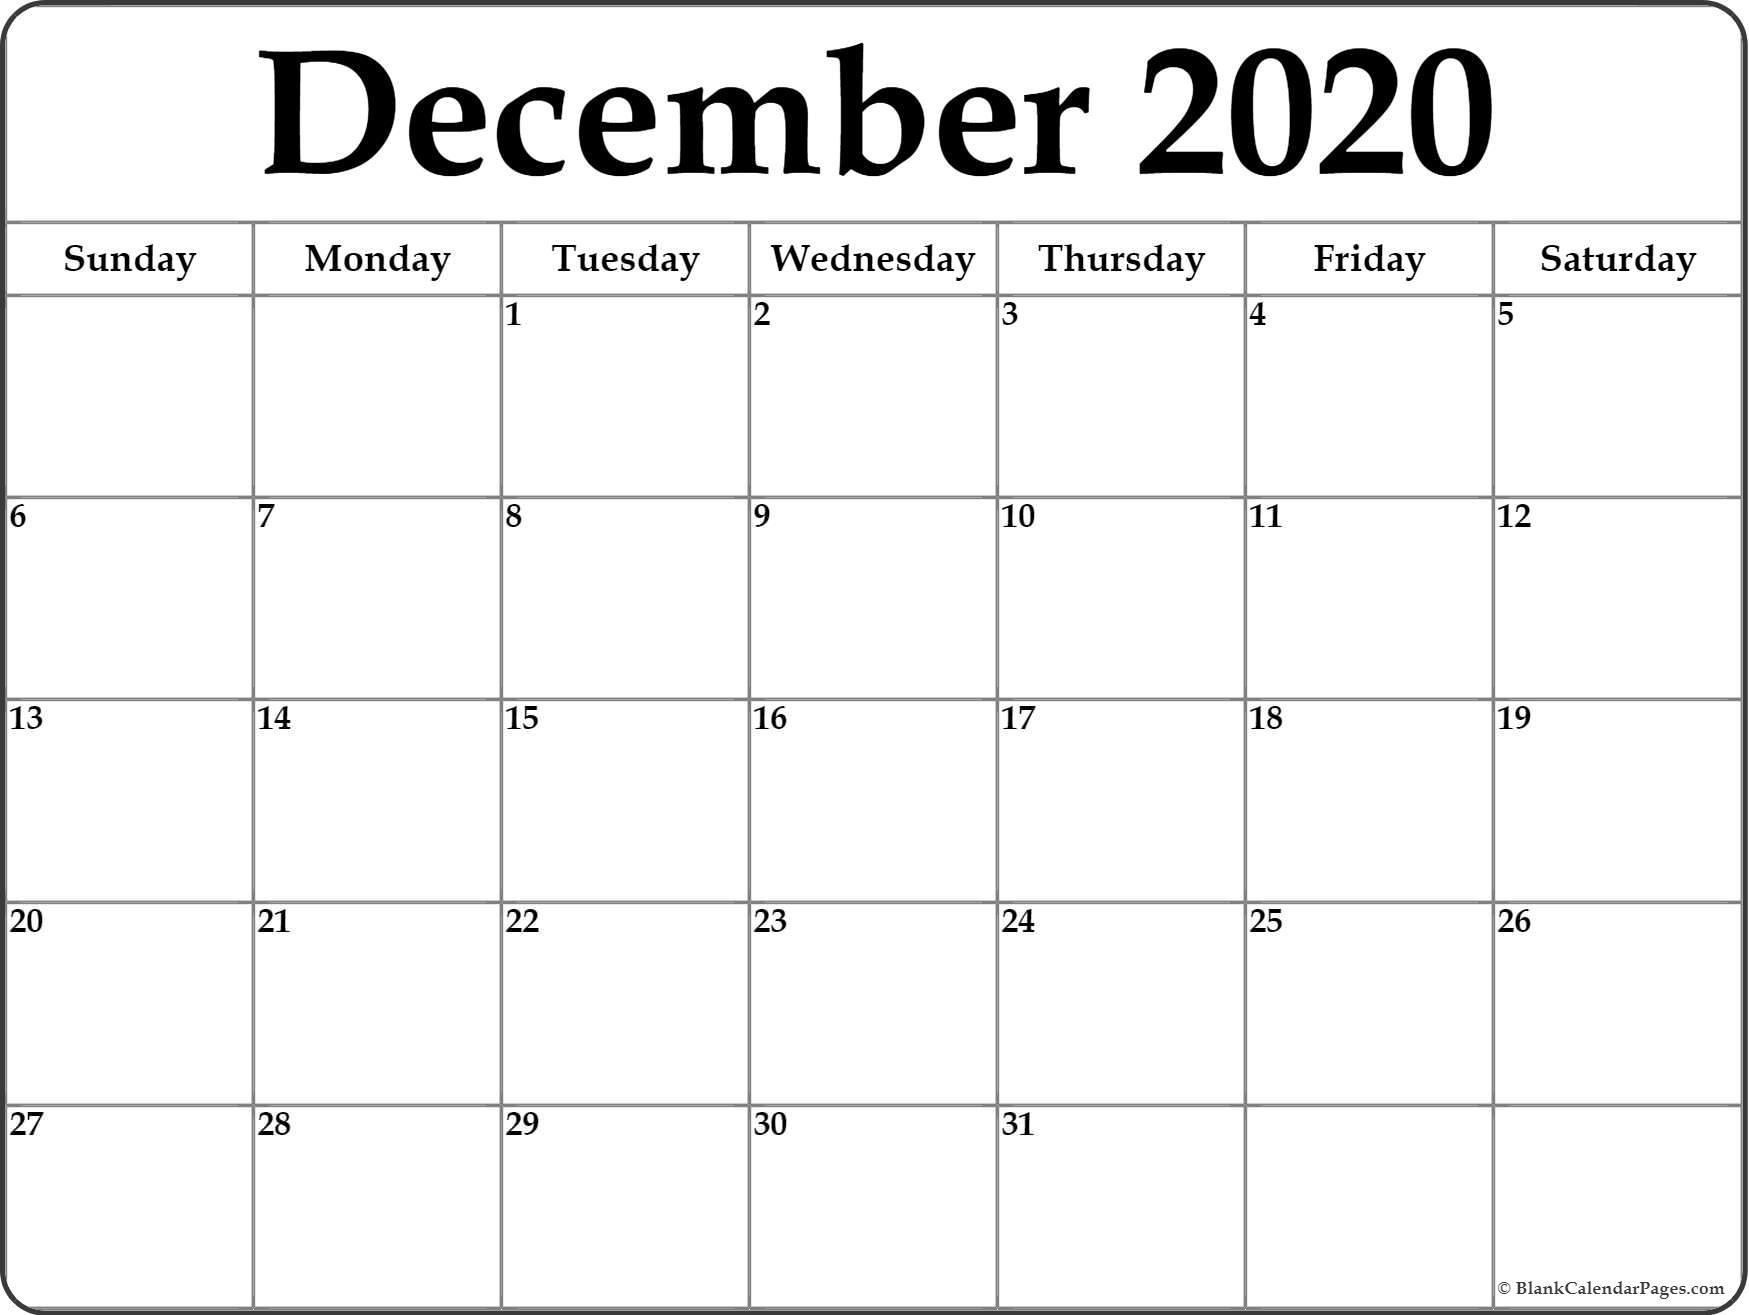 December 2020 Calendar | Free Printable Monthly Calendars